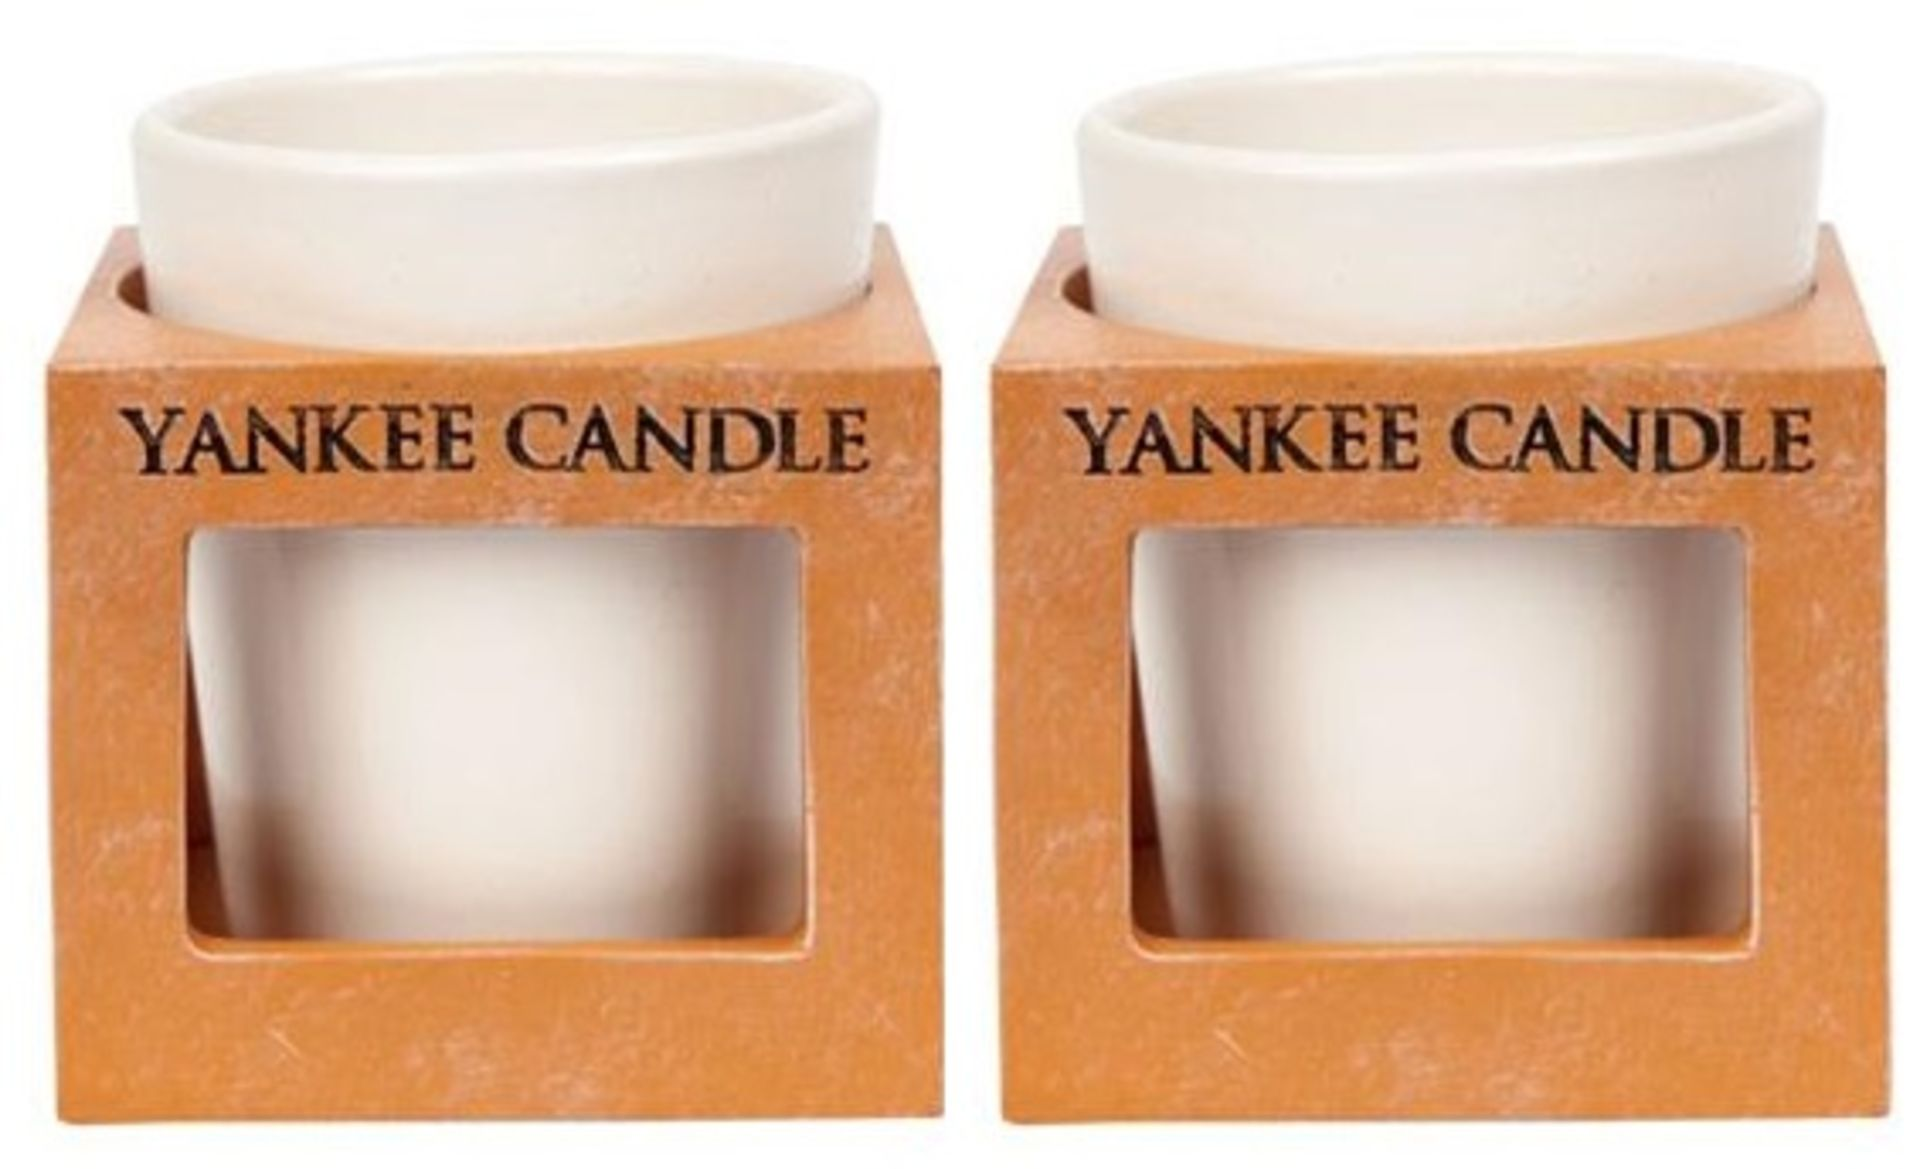 Lot 50108 - V Brand New Set Of 2 Rustic-Modern Terracotta Votive Yankee Candle Holders eBay £20.98